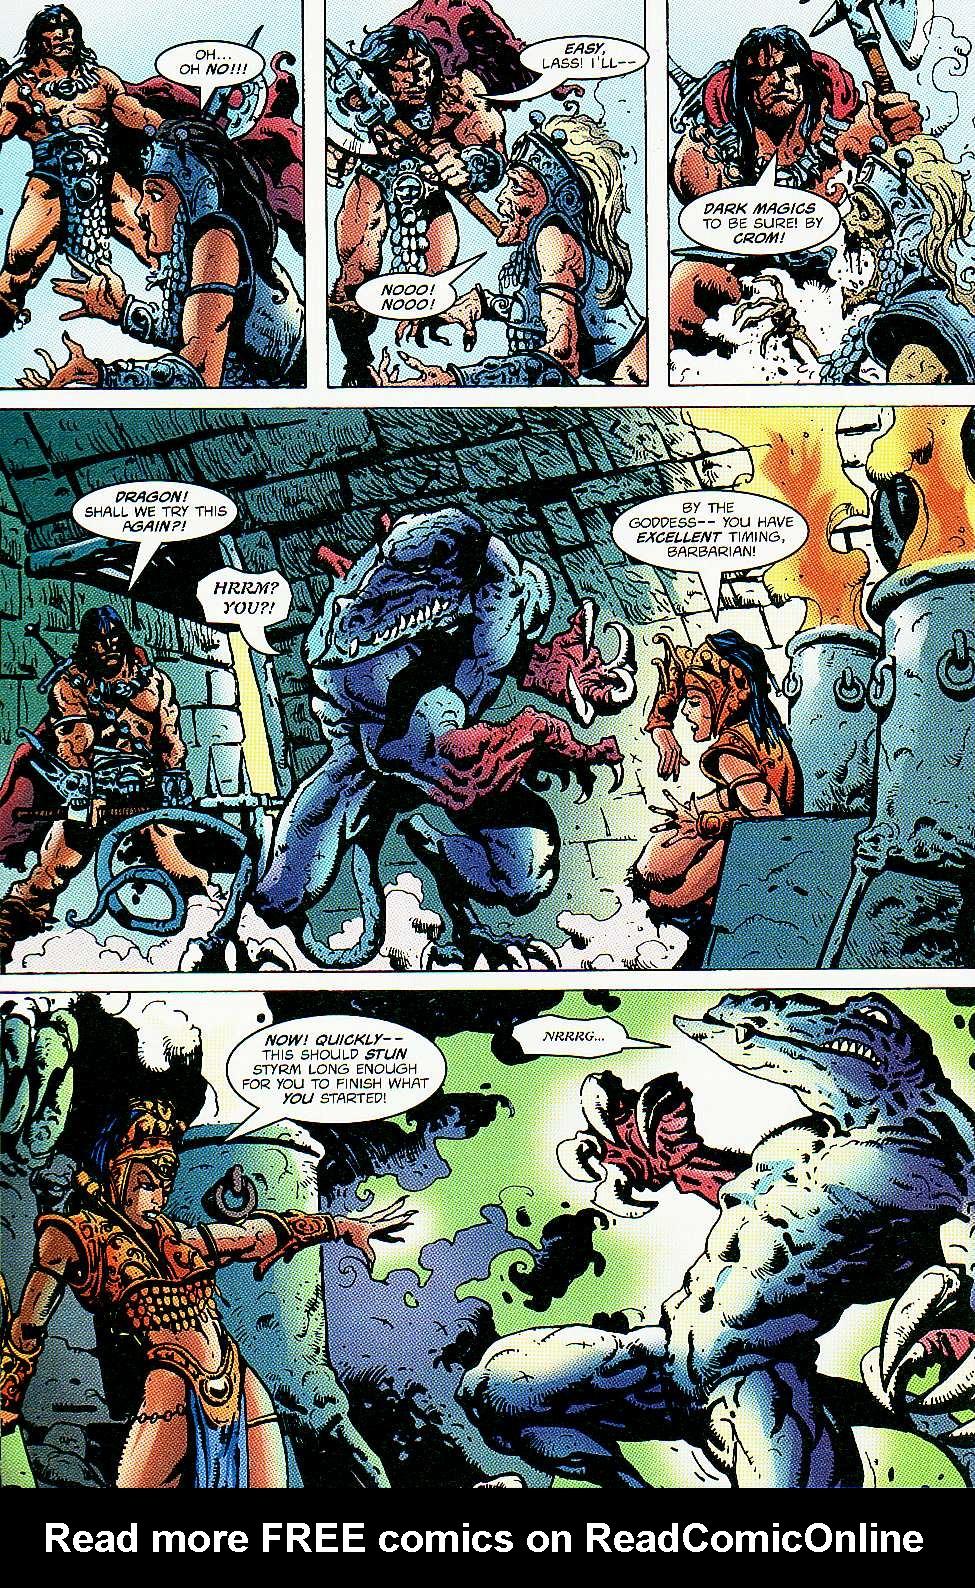 Read online Conan: Return of Styrm comic -  Issue #3 - 21